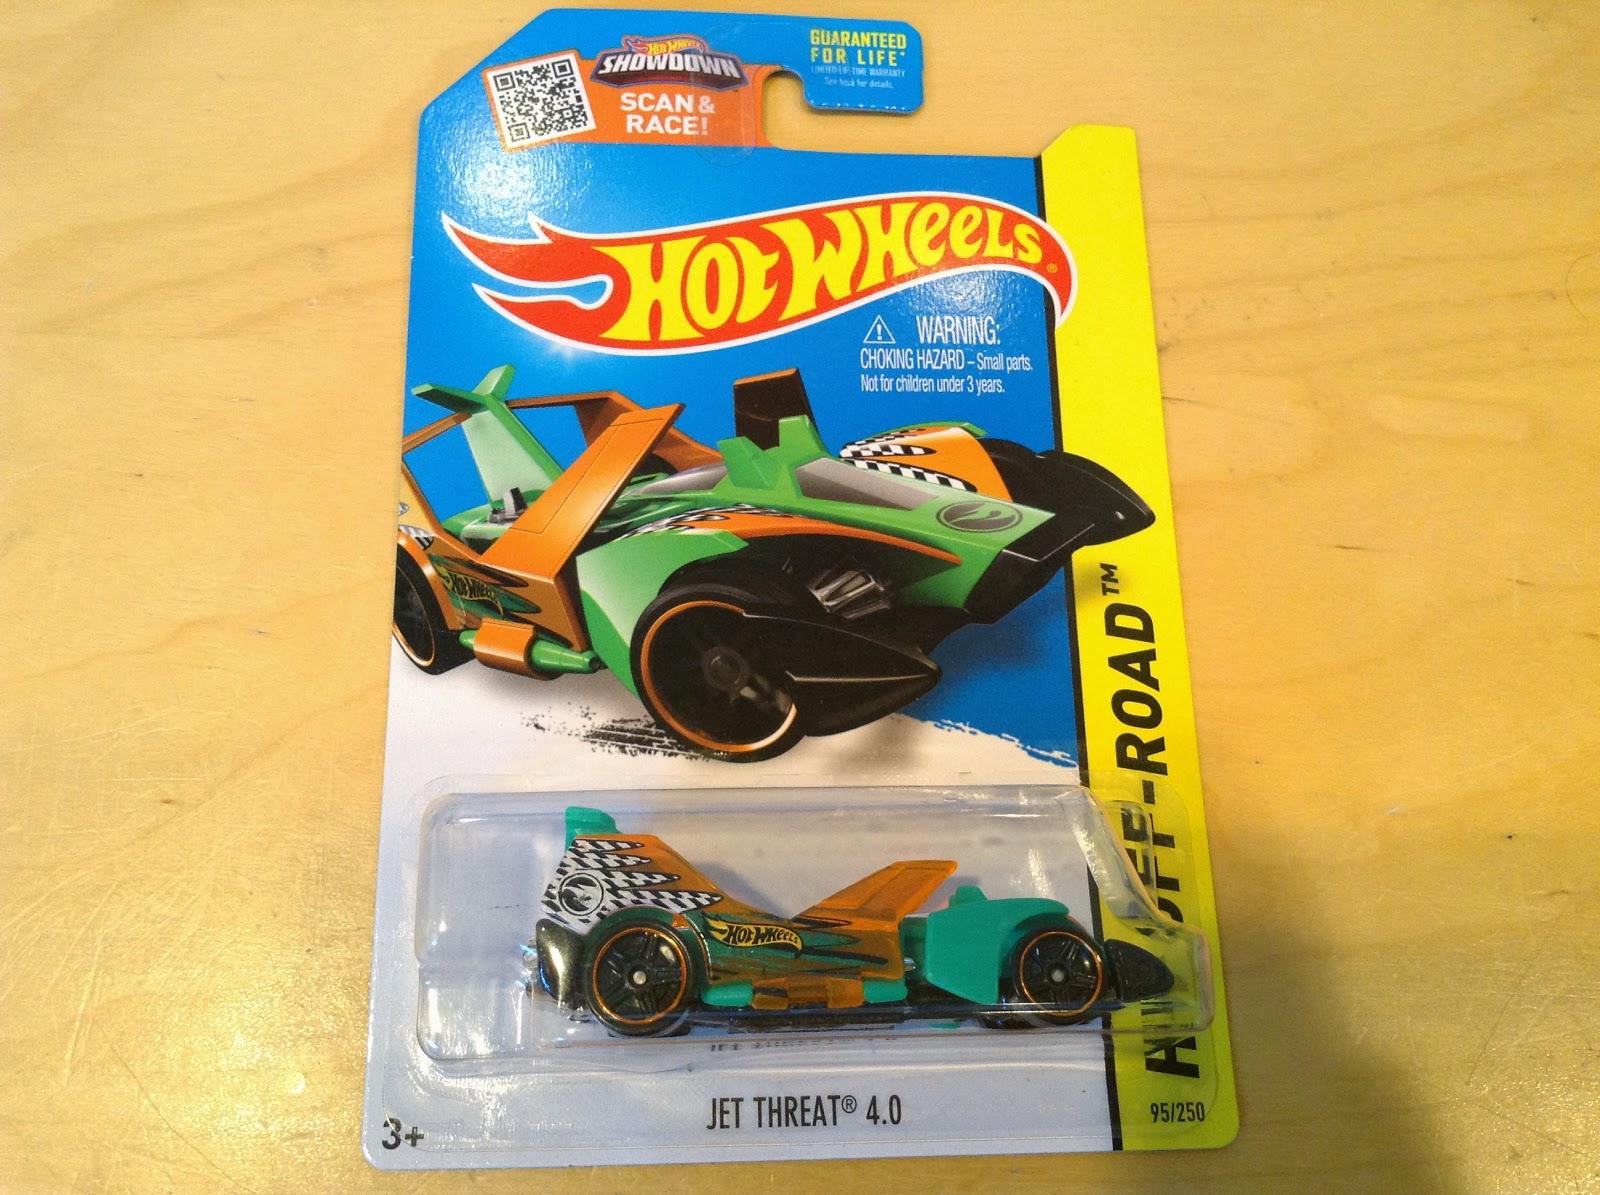 2015 TREASURE HUNT Hot Wheels JET THREAT 4.0 #95 US✰Green//Orange//Black✰Case F